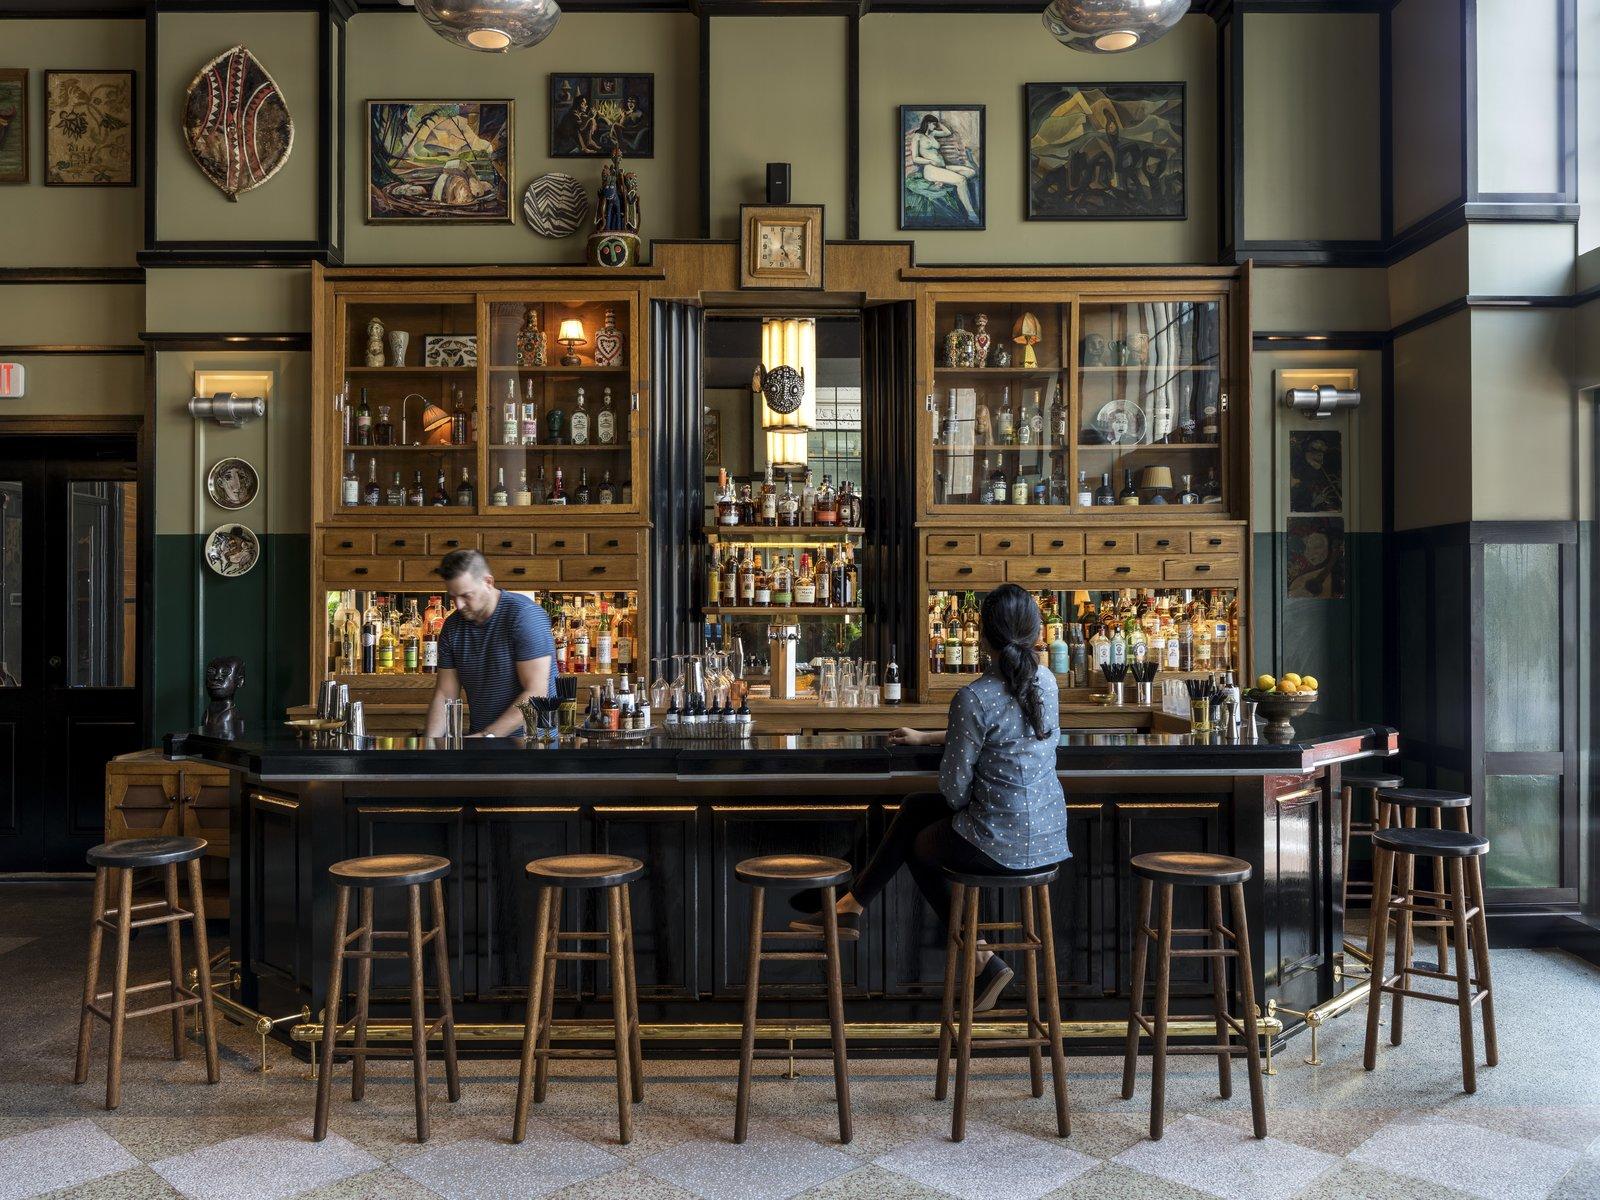 #acehotel #neworleans #louisiana #hospitality #classic #modern  Photo courtesy of Ace Hotel, New Orleans